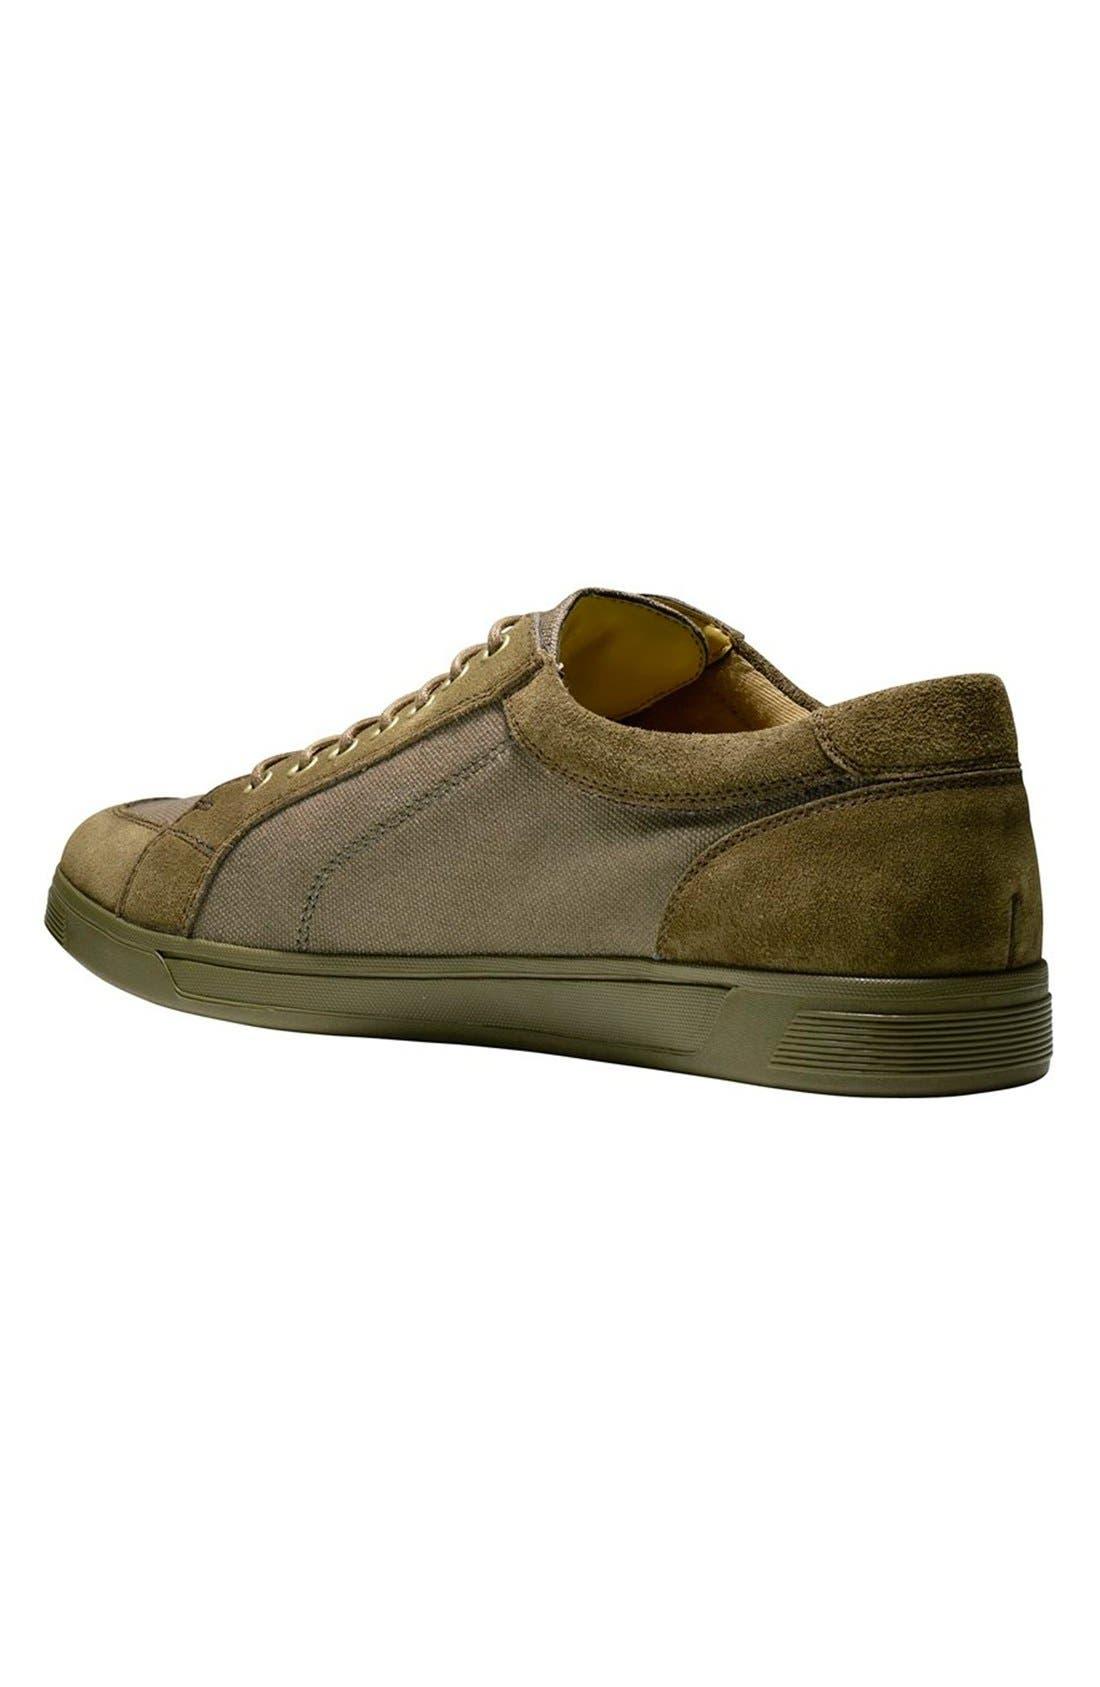 'Vartan Sport Oxford' Sneaker,                             Alternate thumbnail 42, color,